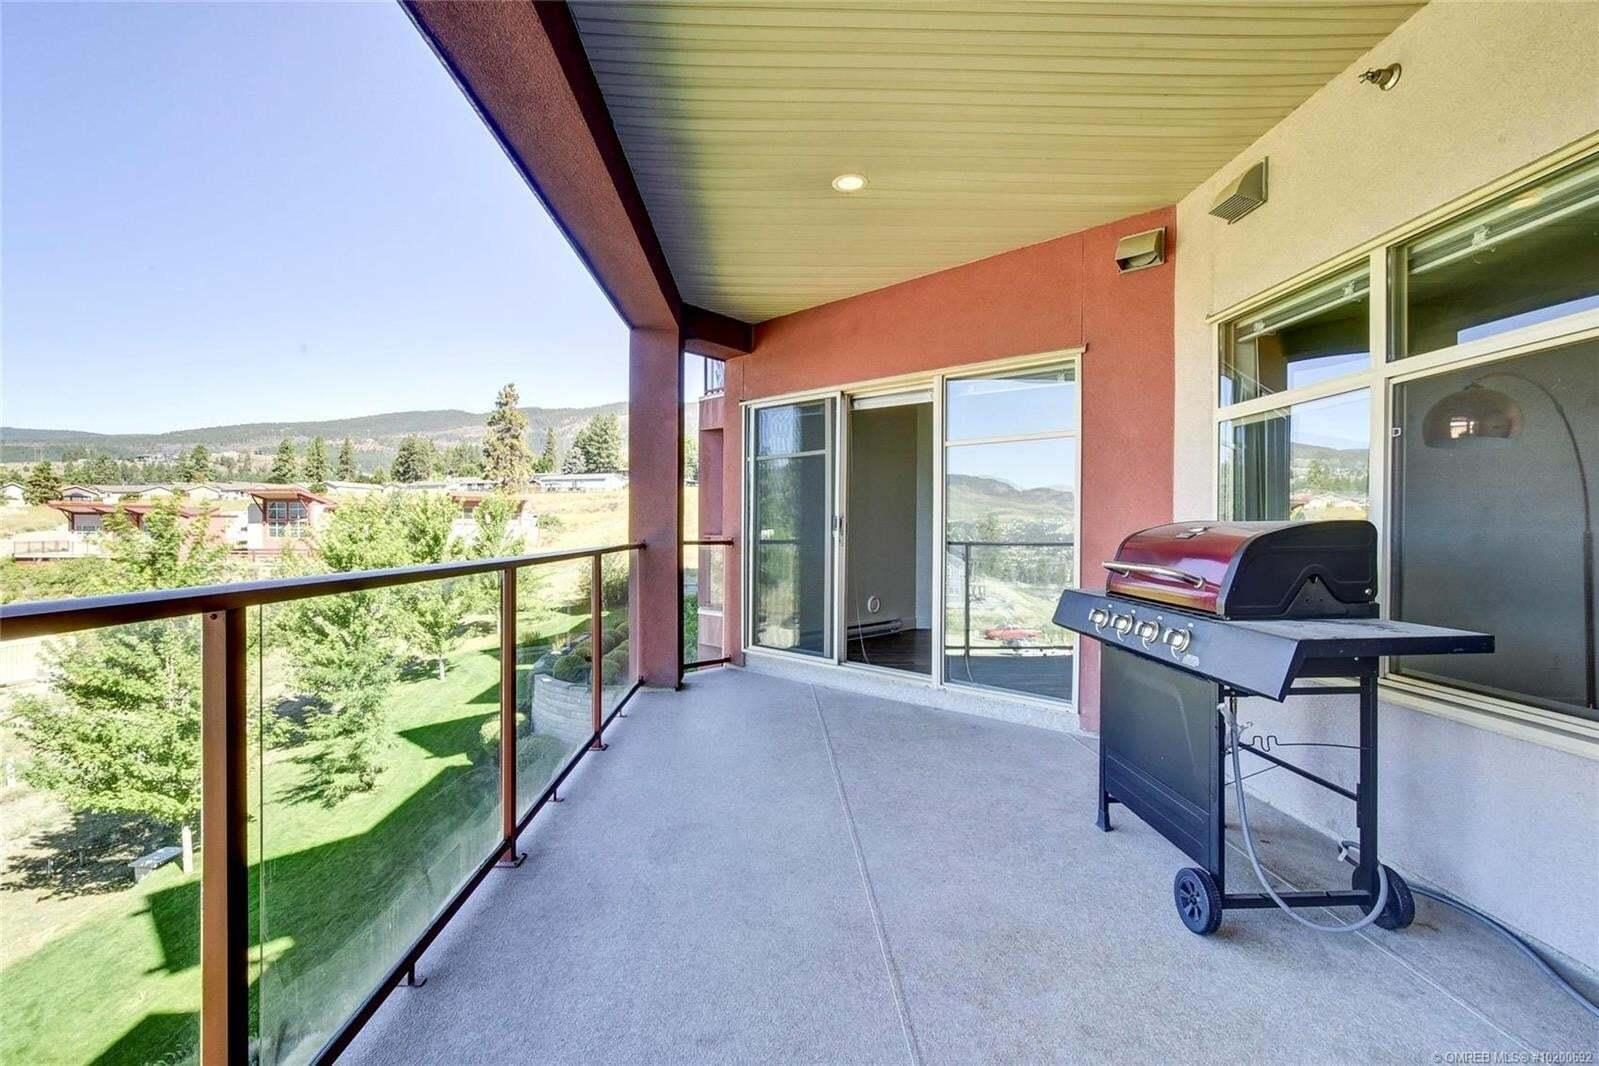 Condo for sale at 3220 Skyview Ln Unit 305 West Kelowna British Columbia - MLS: 10200692